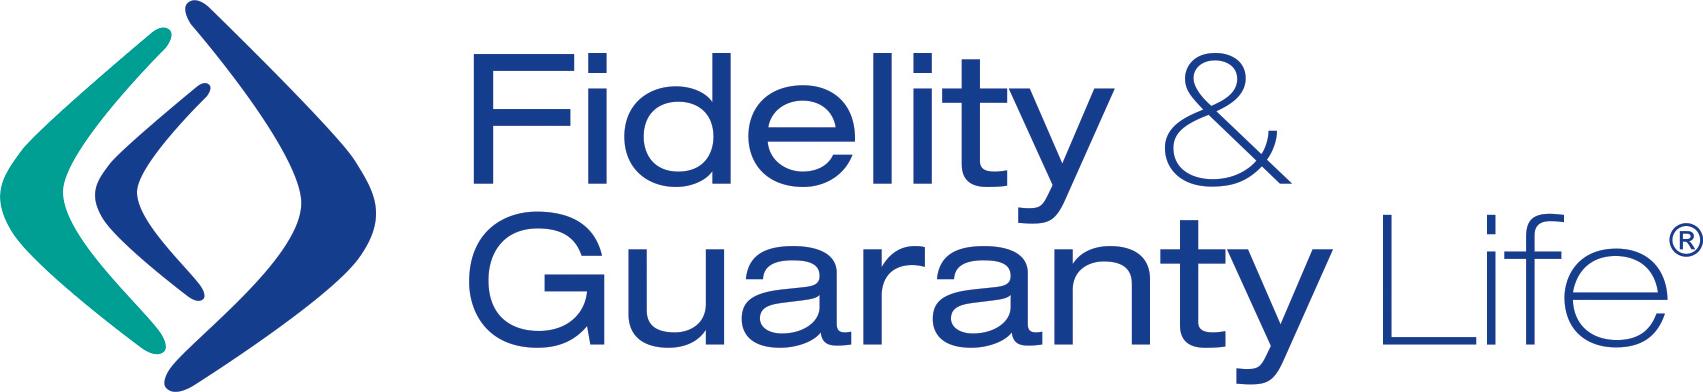 fidelity-guaranty-life-sponsor-logo-impact-iowa-honoring-americas-heroes